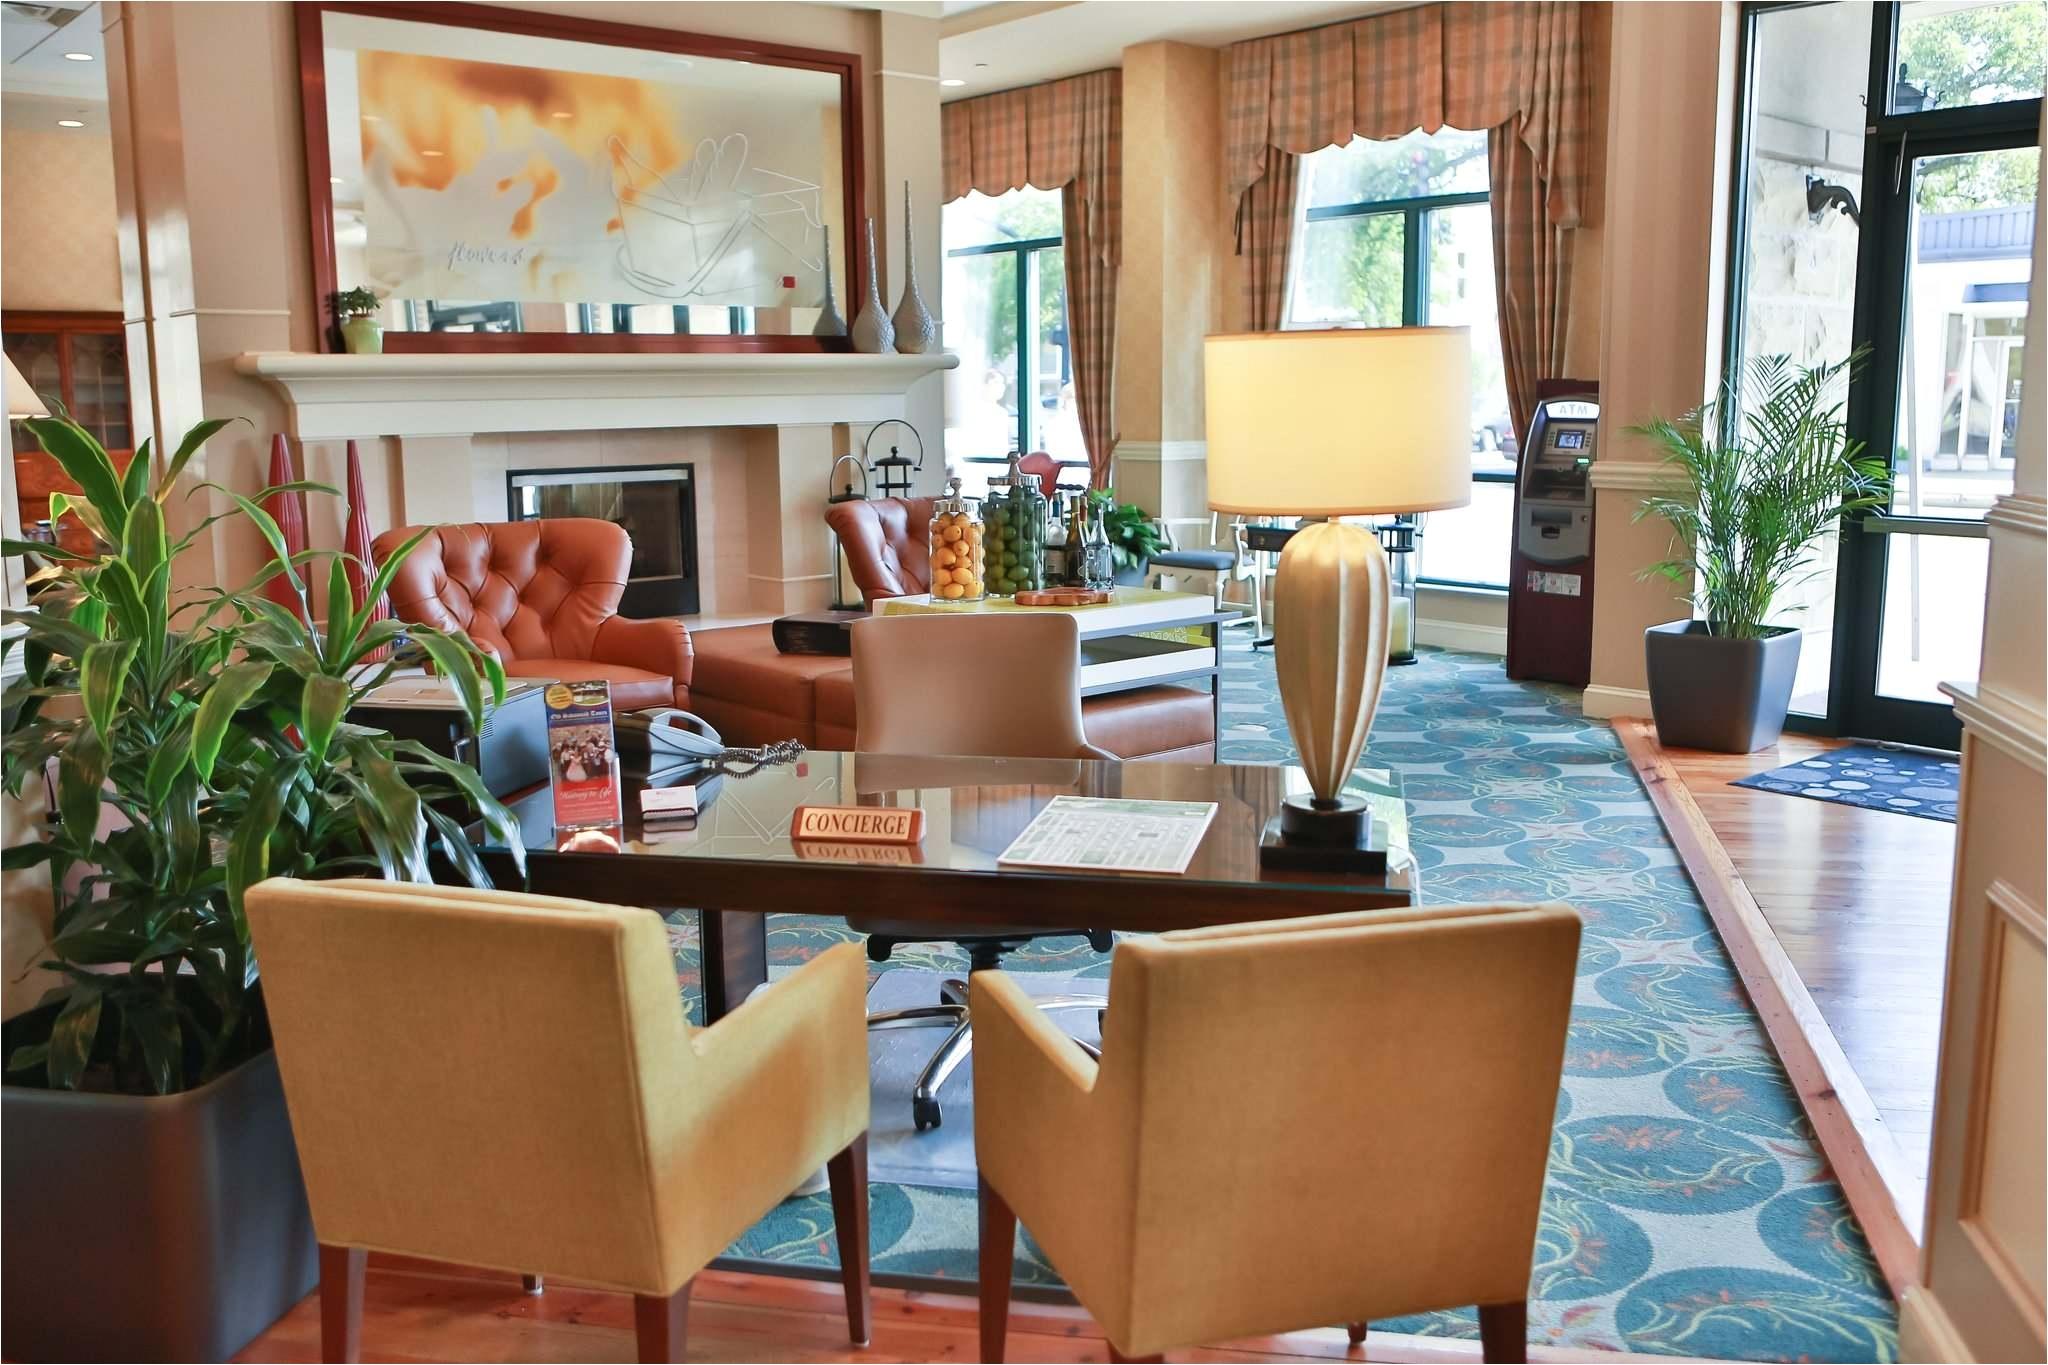 25 one bedroom apartments in savannah ga ordinary hilton garden inn savannah historic district